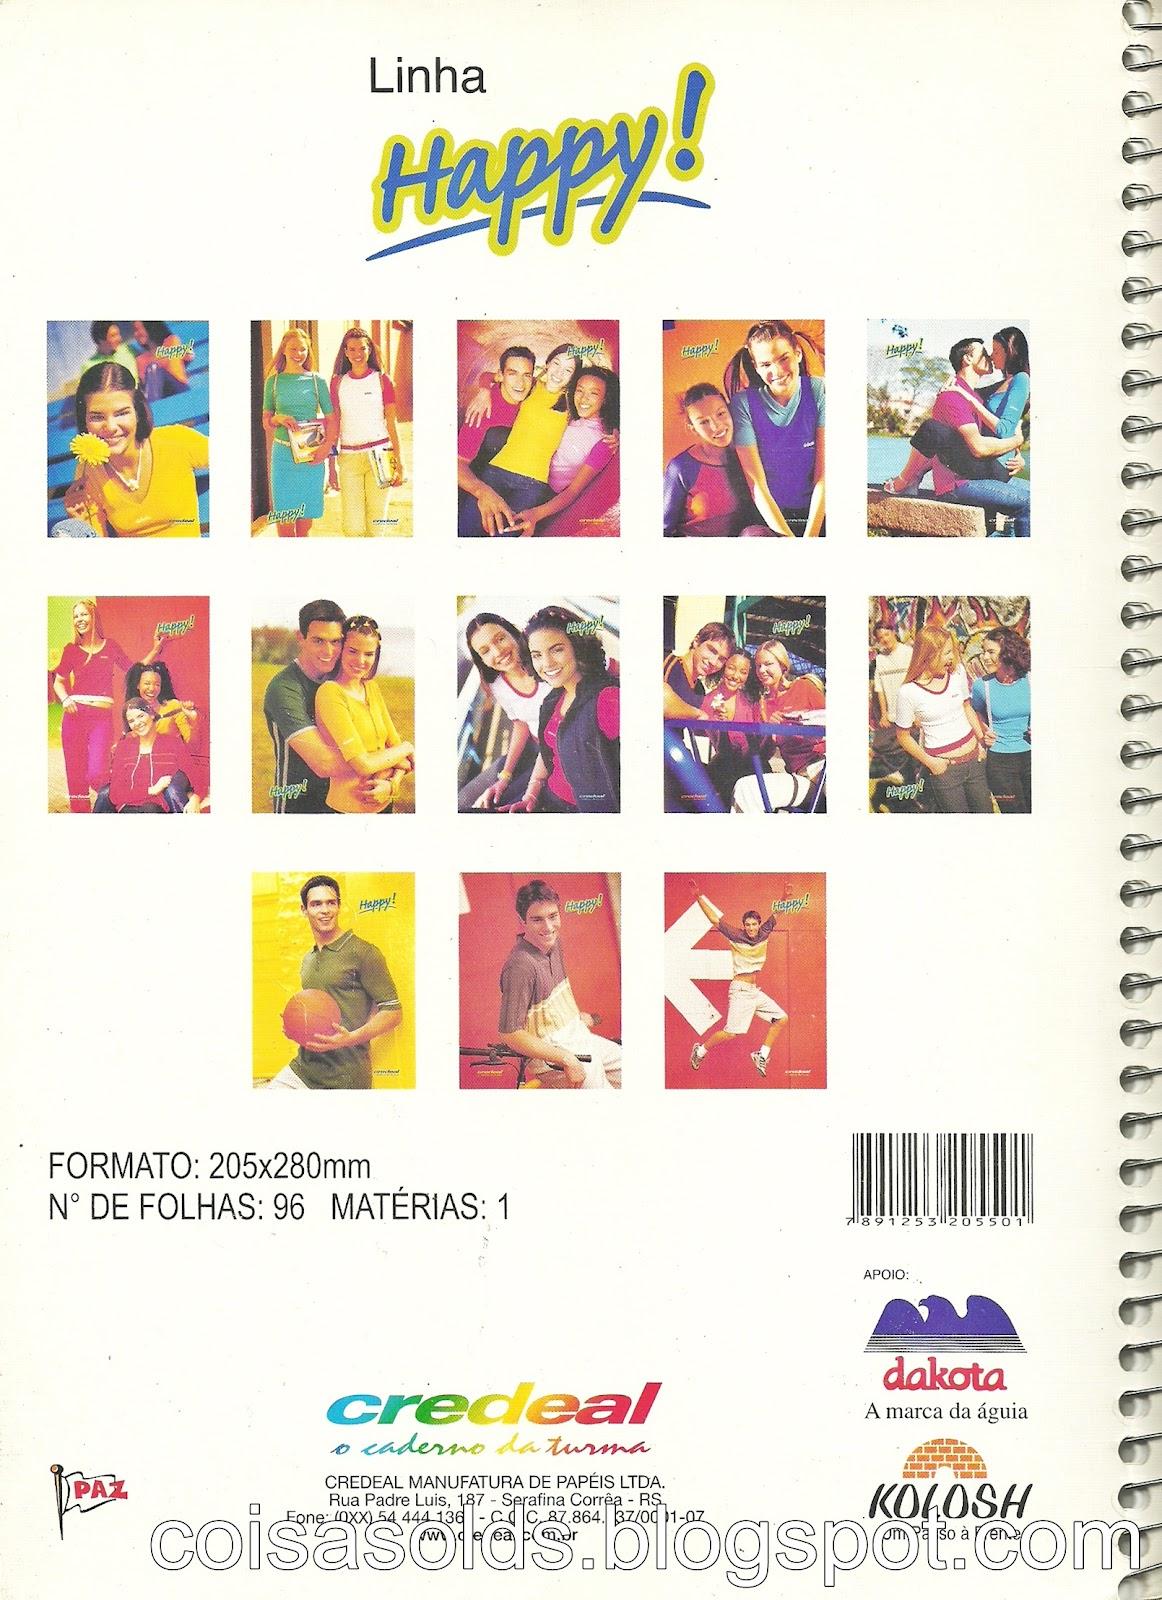 caderno+credeal+happy+pessoas+na+capa+sorrindo+olds+velhos+2.jpg